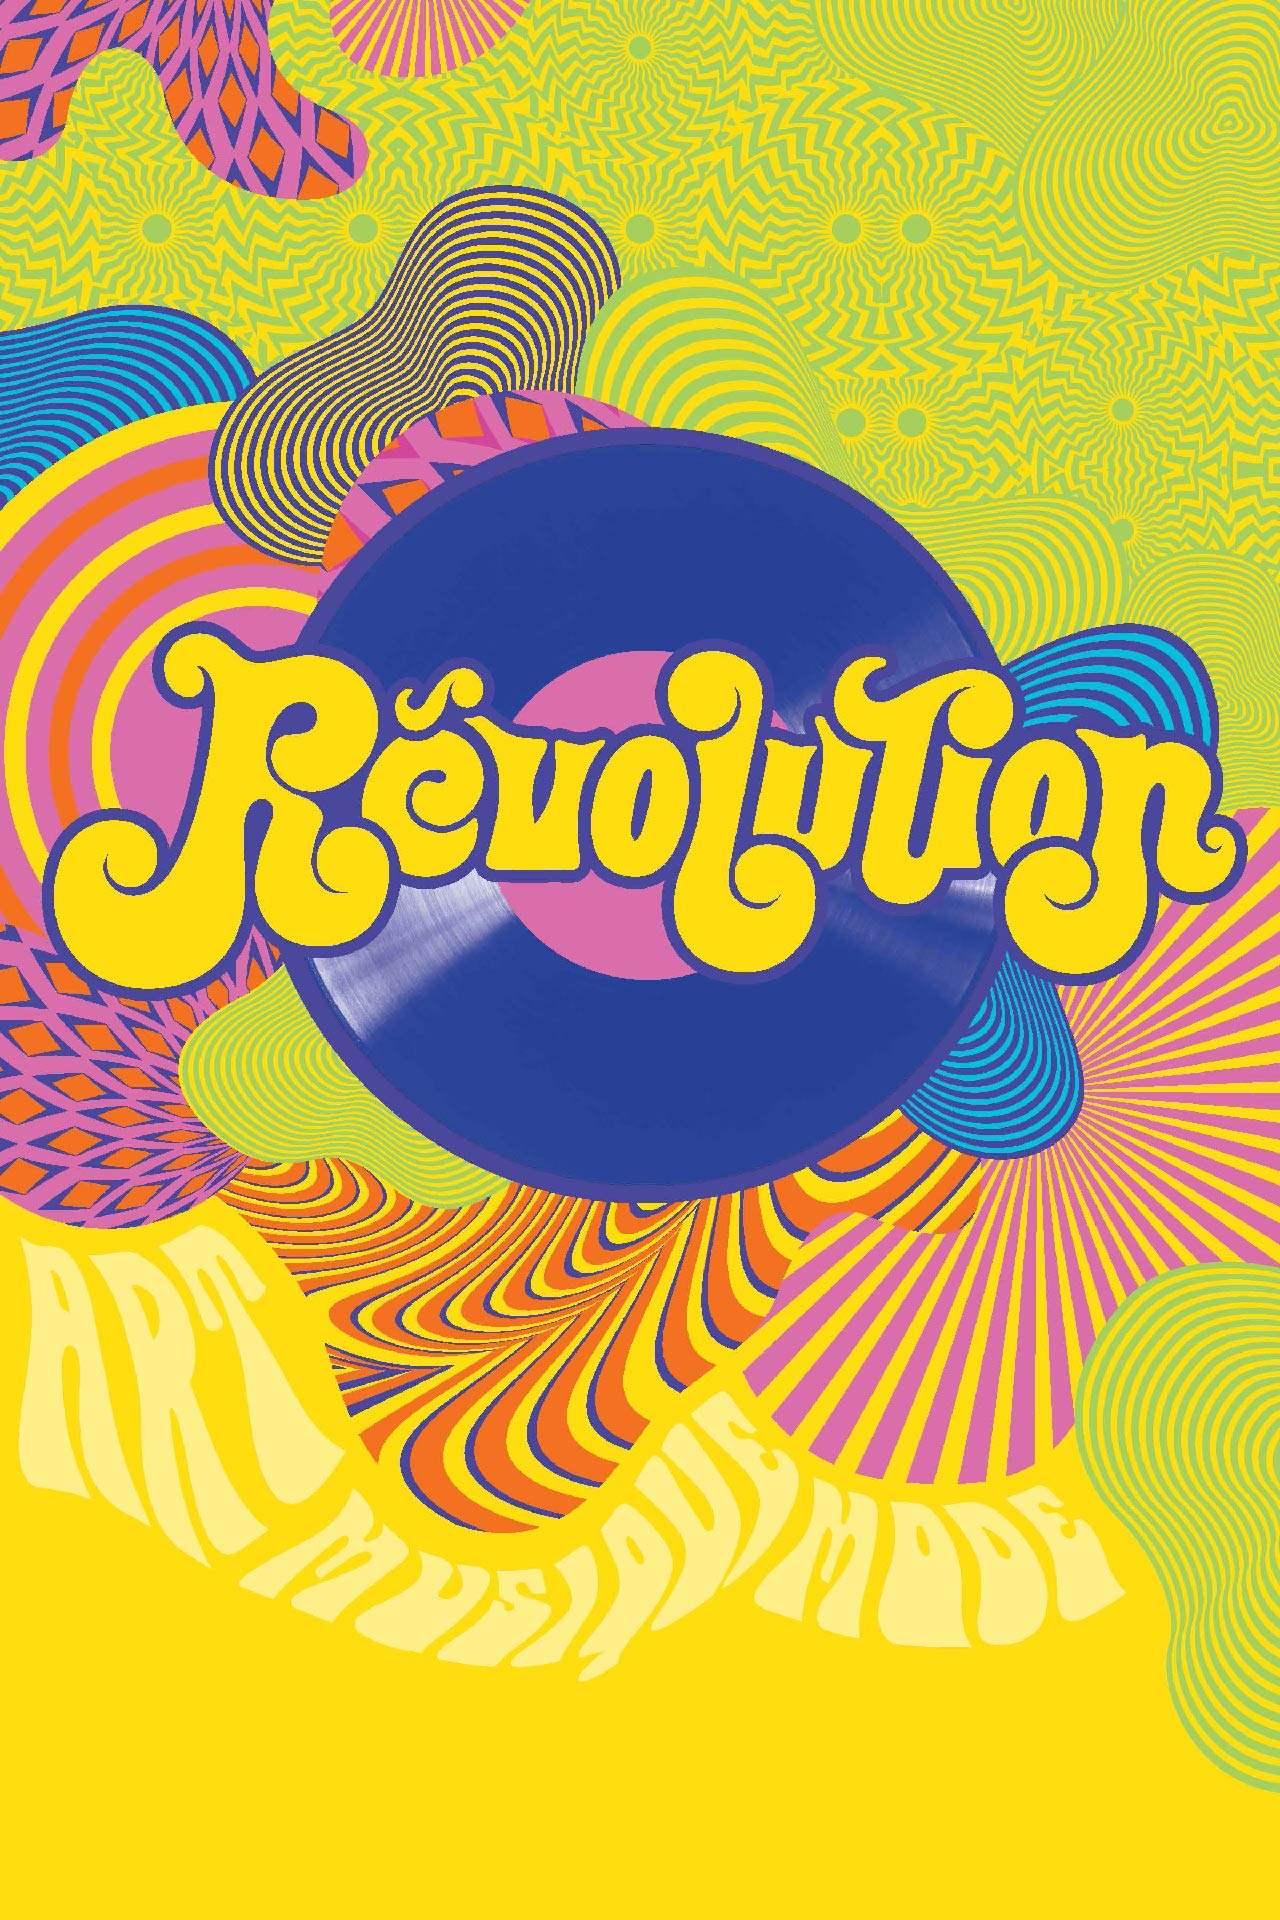 Revolution Exhibition, Photo MMFA